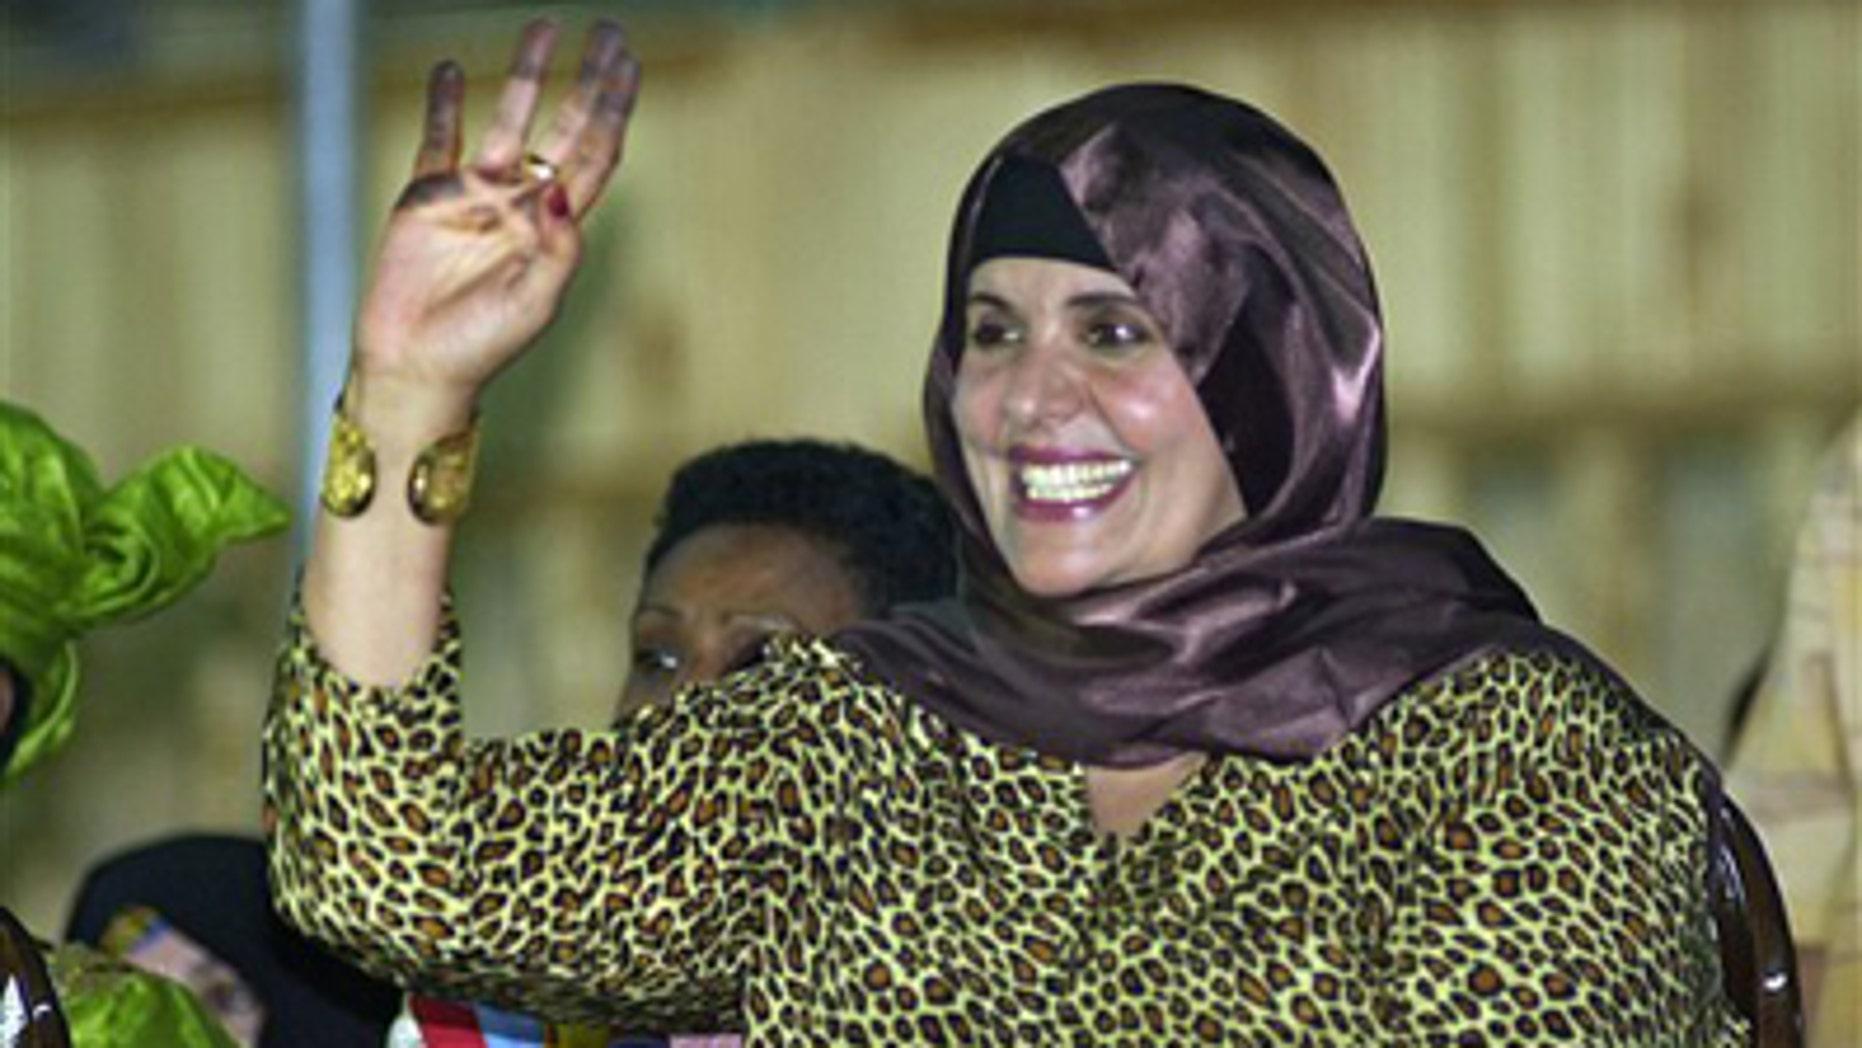 In this Monday, Sept. 1, 2003 file photo, showing Safiya Gadhafi, the wife of Libyan leader Muammar Qaddafi, waves at Libyan soldiers during a military parade at Tripoli's main square.